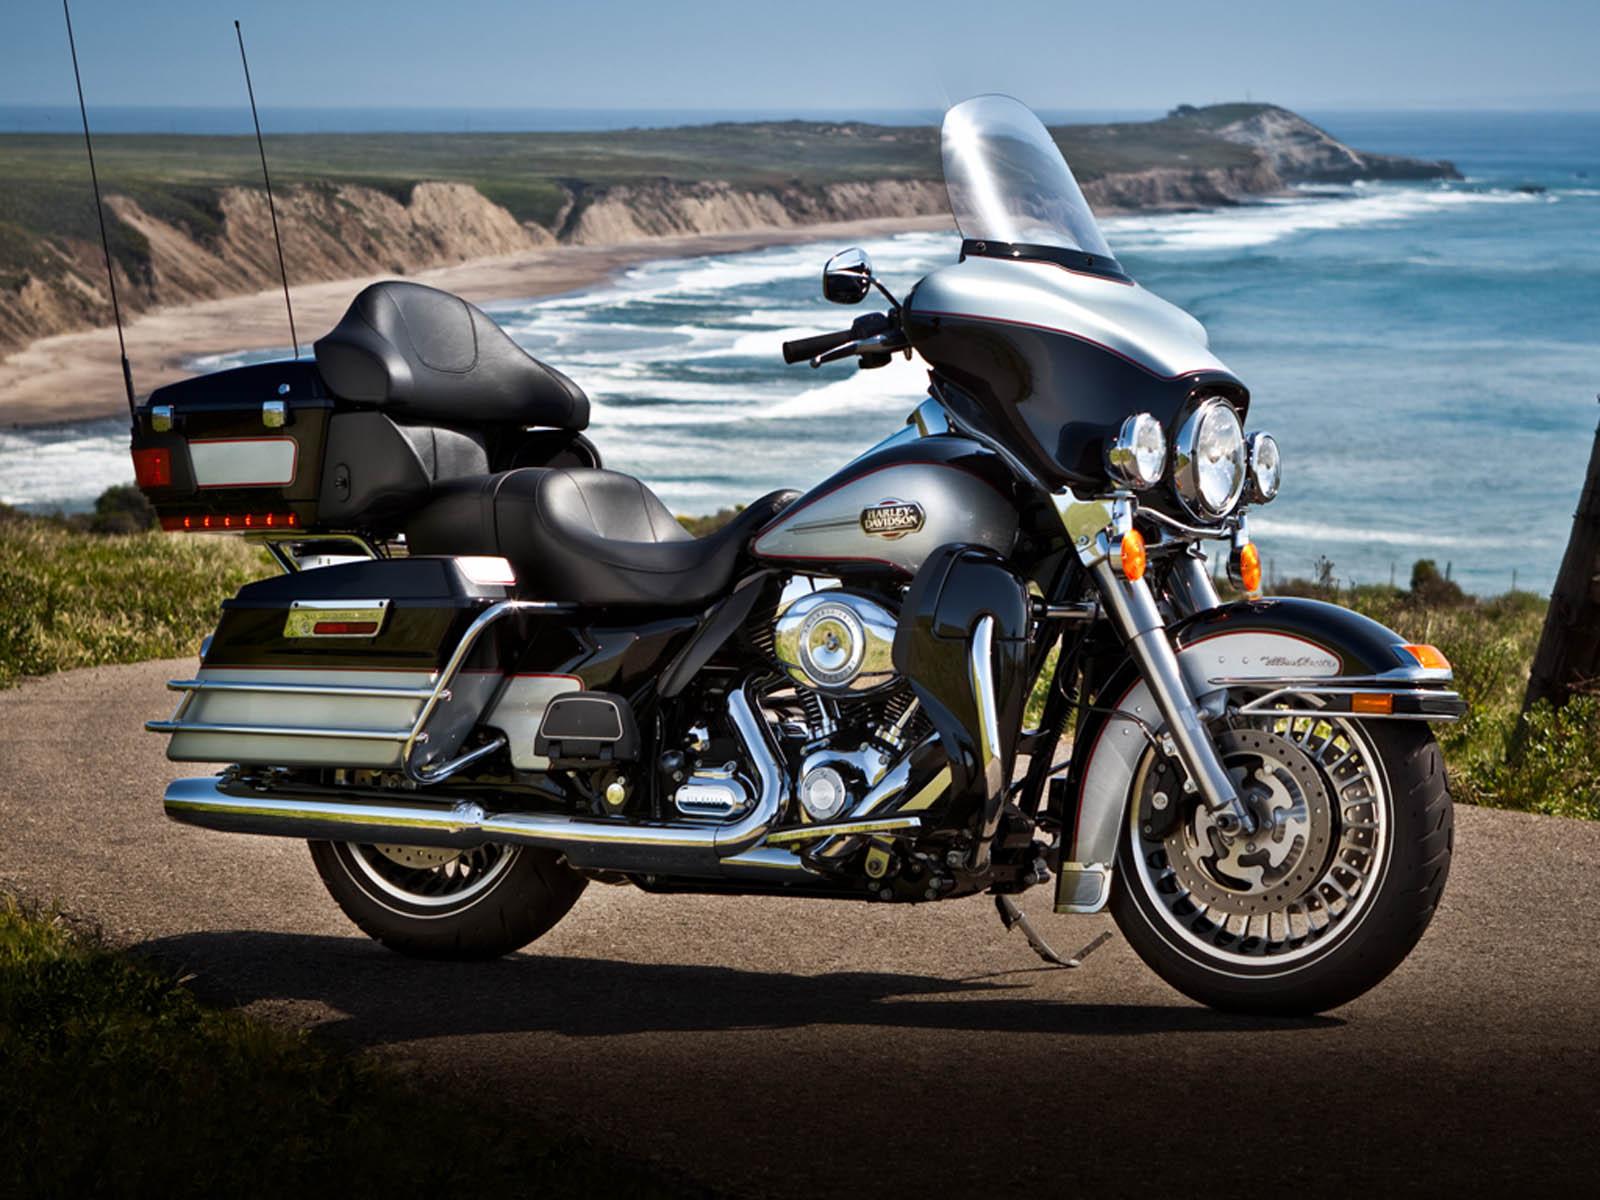 the Harley Davidson Ultra Classic Electra Glide FLHTCU Bike Wallpapers 1600x1200